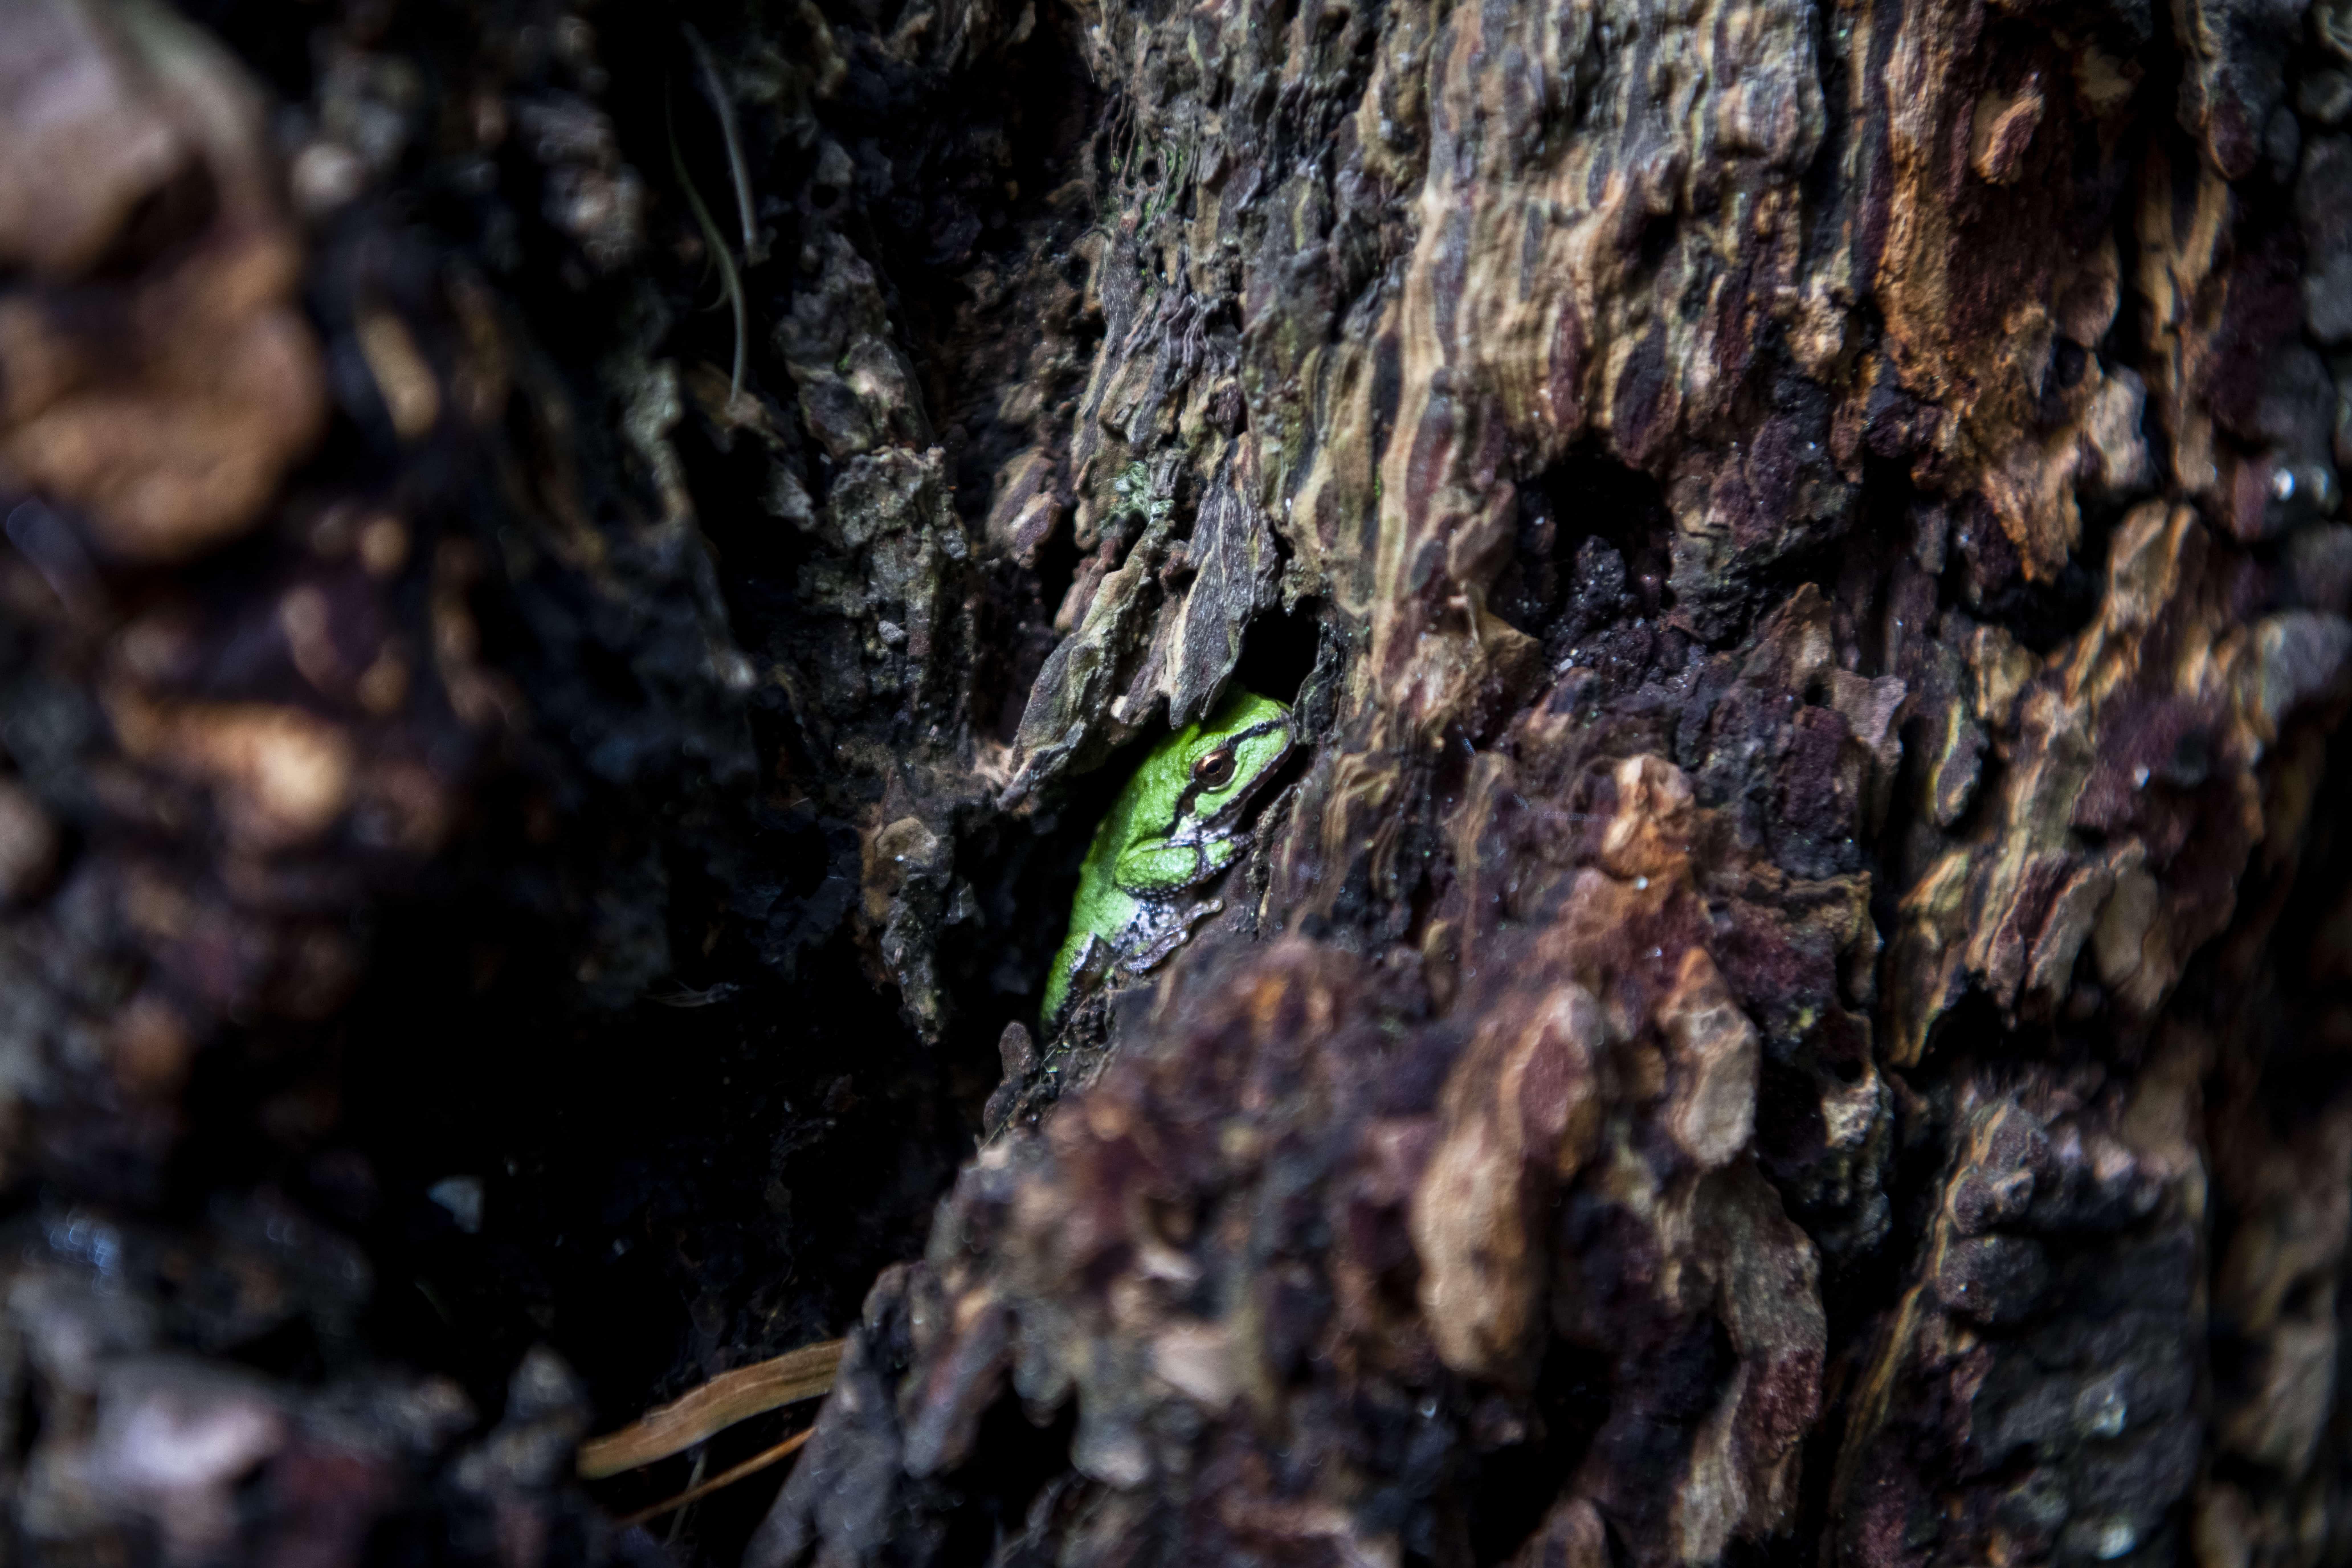 Green frog on a tree at Northwest Trek Wildlife Park